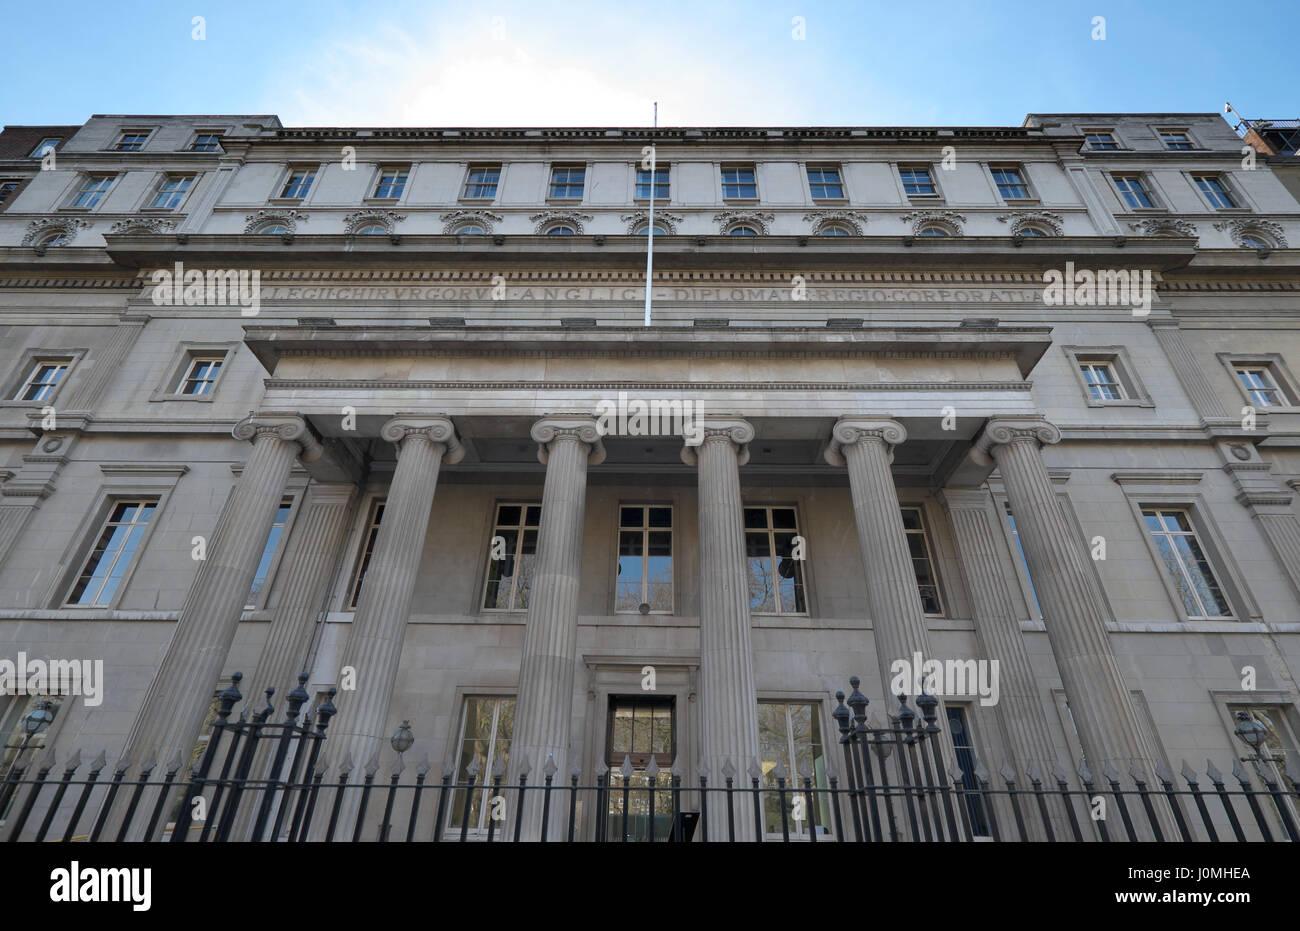 royal college of surgeons london - Stock Image